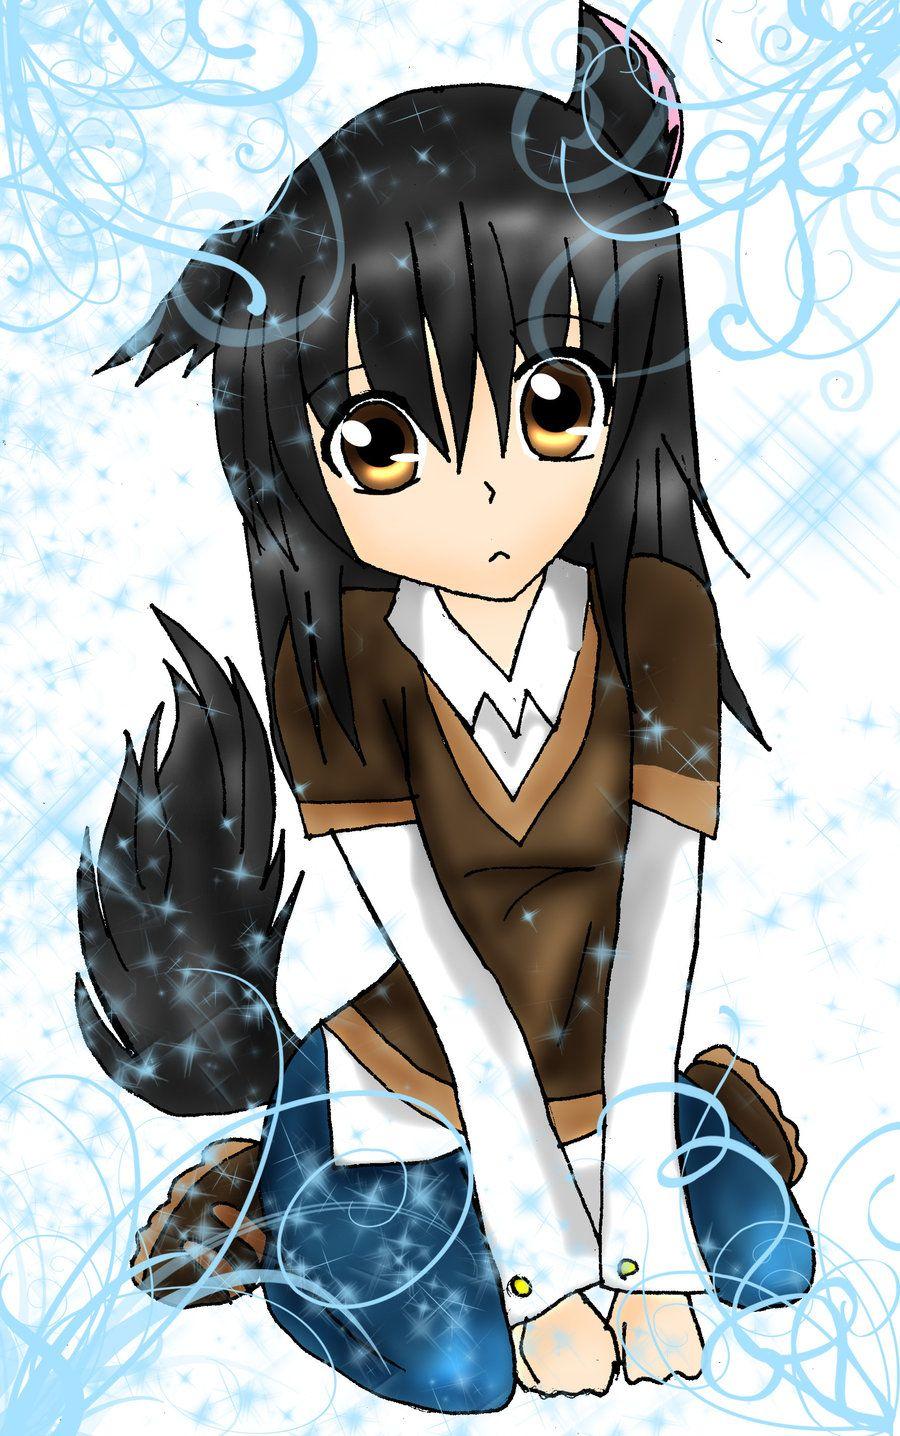 wolf girl anime Google Search Random fan made art